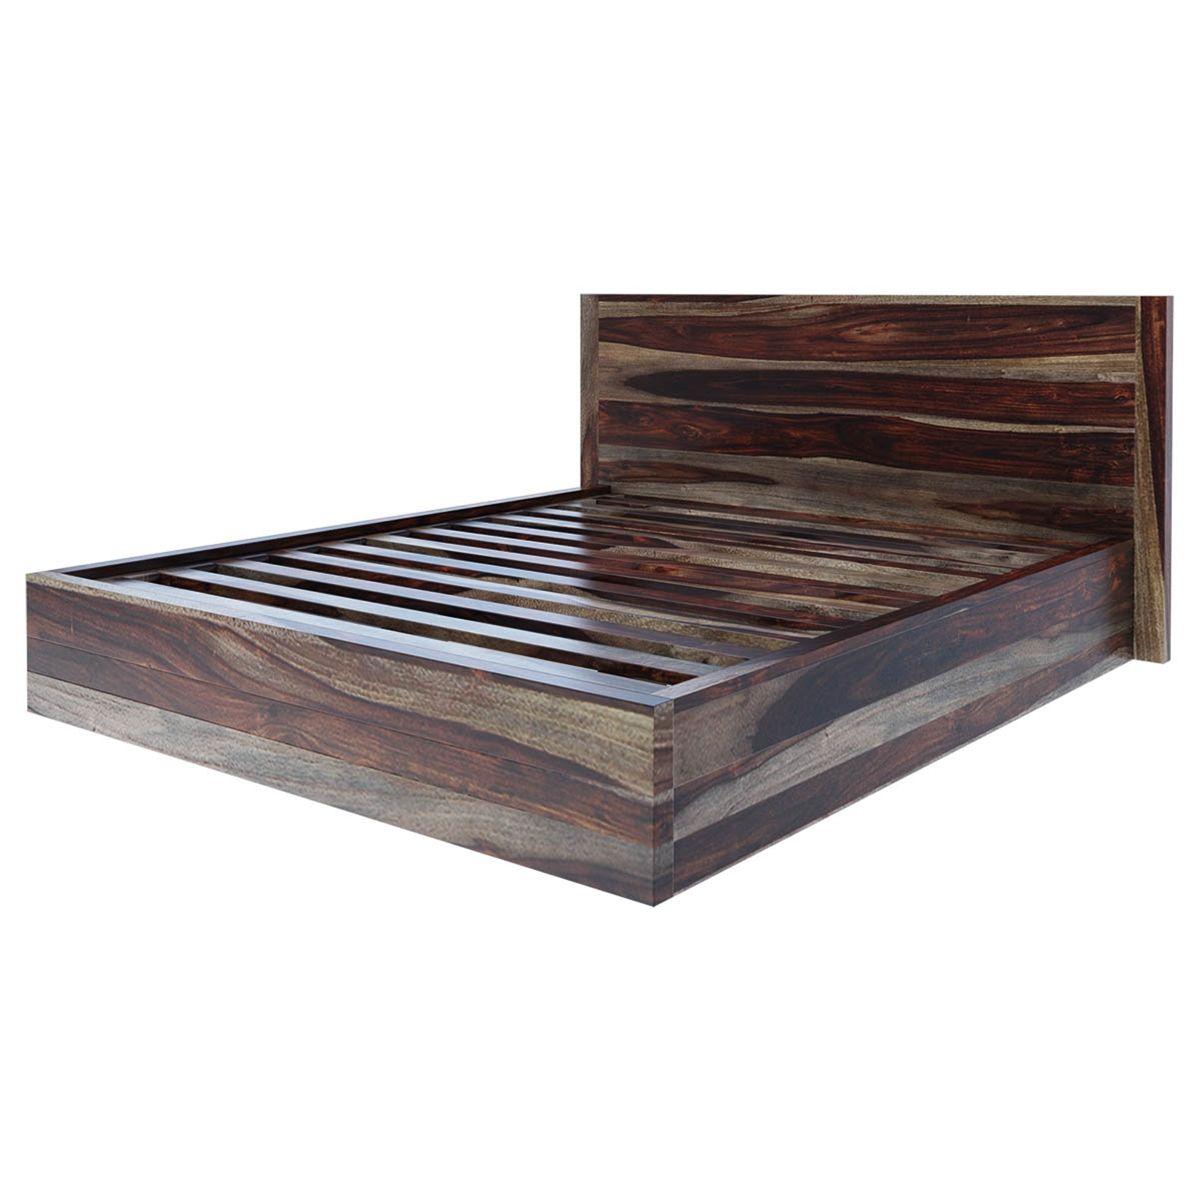 Jamaica Rustic Solid Wood Handcrafted Platform Bed In 2021 Wooden King Size Bed Solid Wood Platform Bed Platform Bed